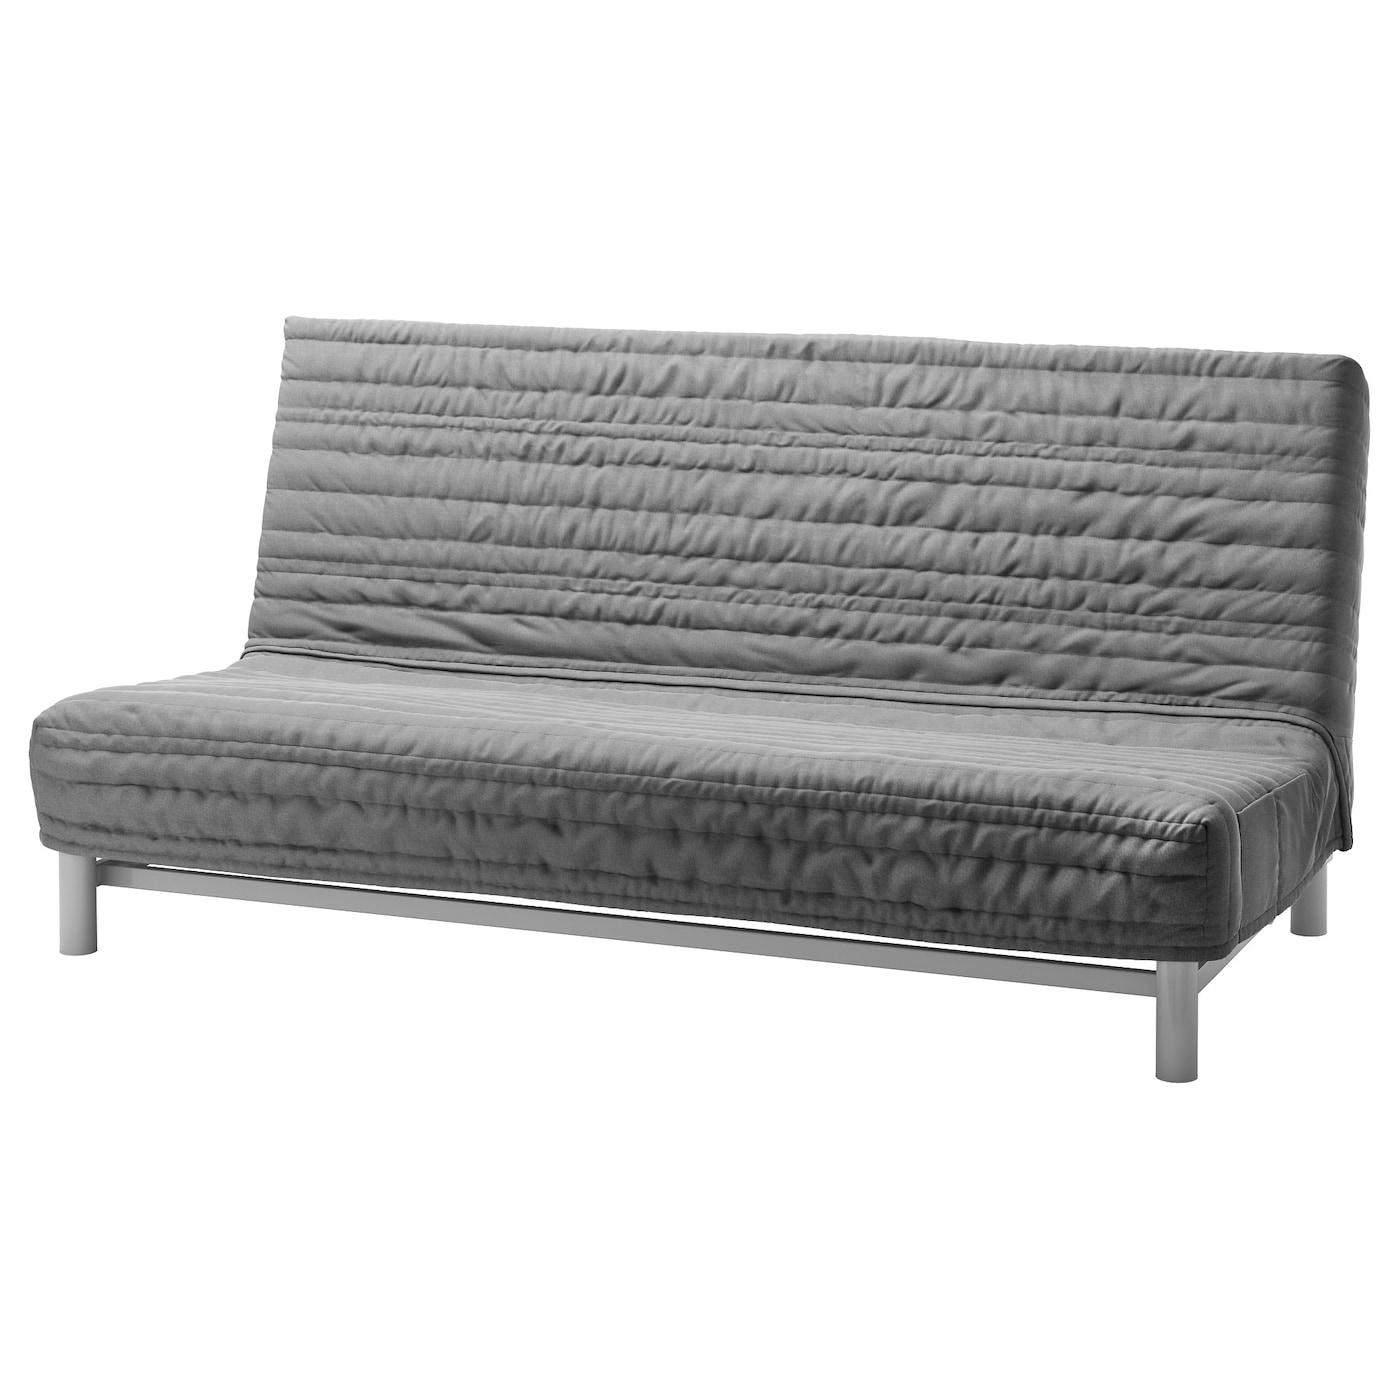 Schlafsofa ikea beddinge  BEDDINGE Three-seat sofa-bed cover Knisa light grey - IKEA